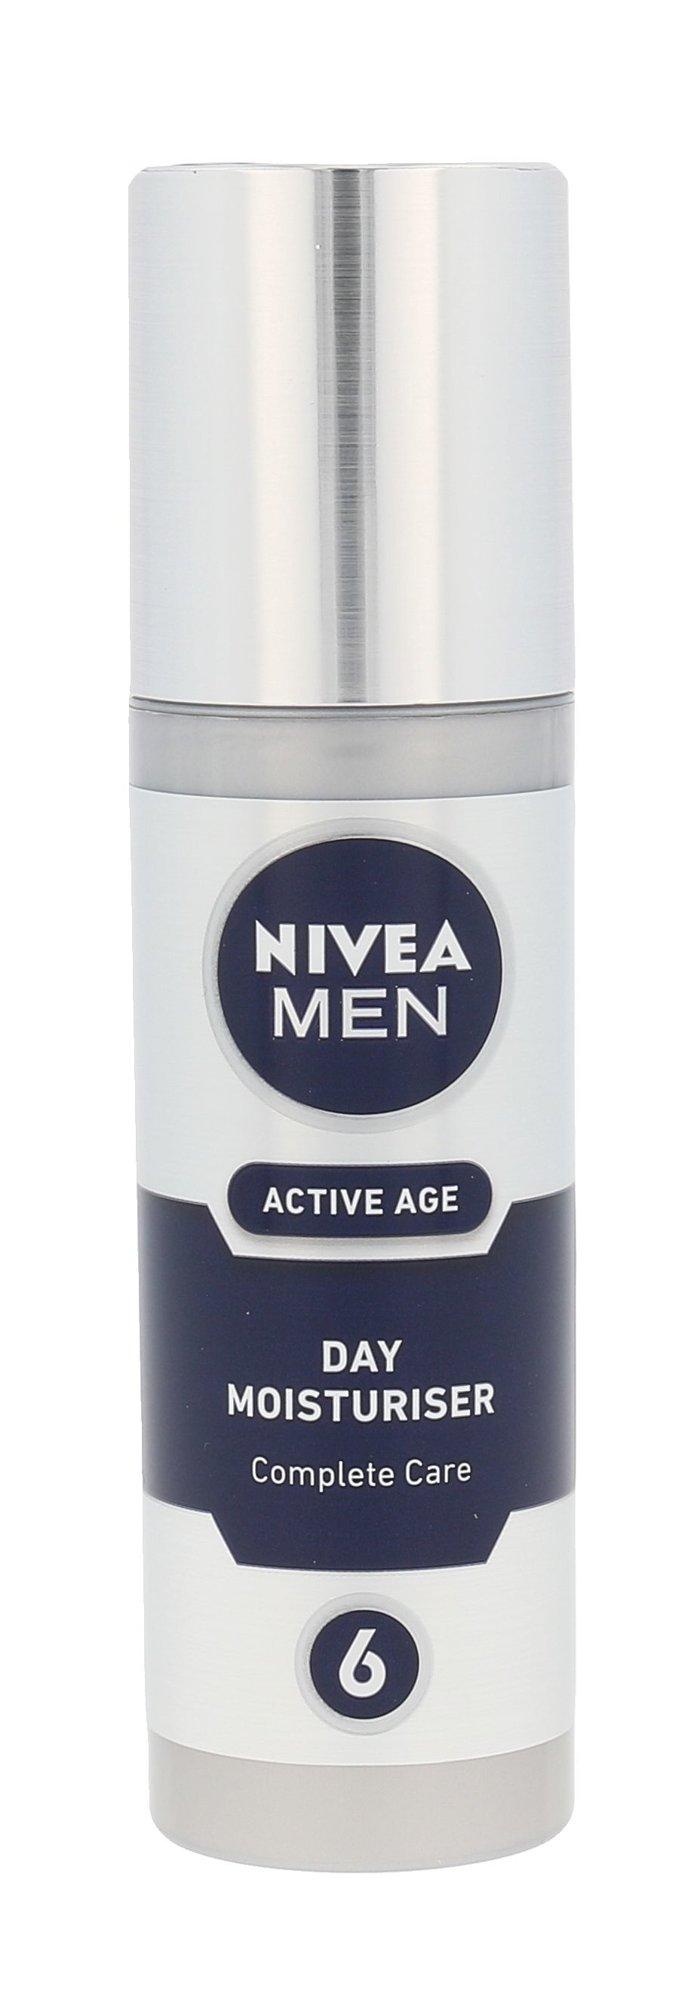 Nivea Men Active Age Cosmetic 50ml